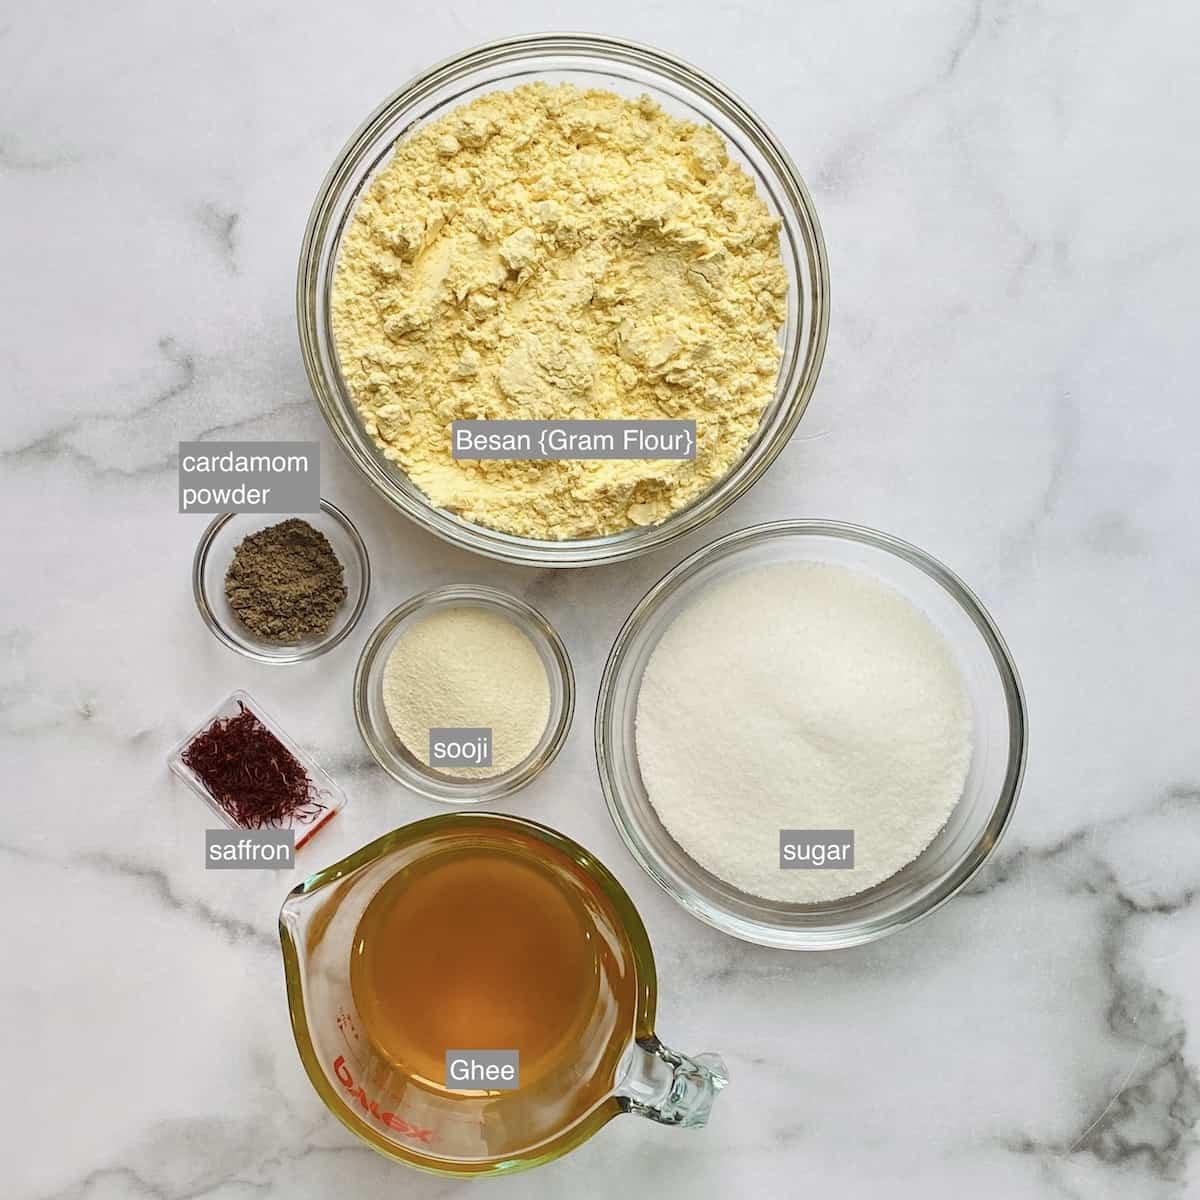 ingredients for besan burfi